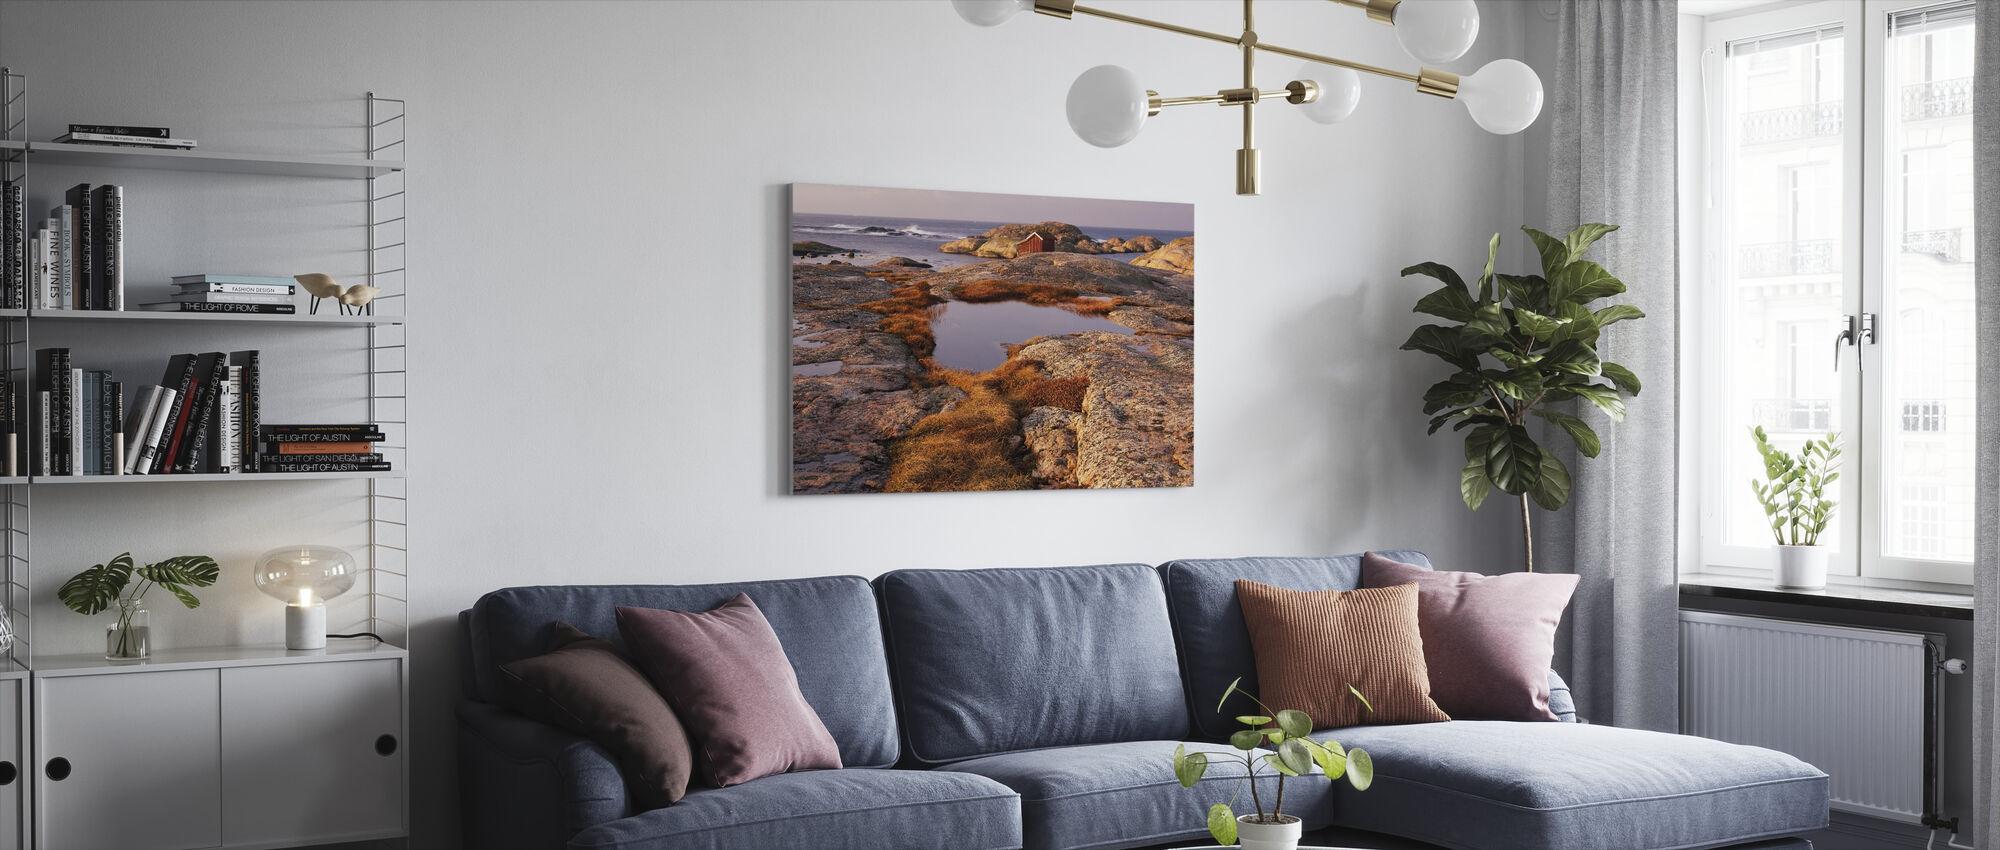 View of the Archipelago - Swedish West Coast - Canvas print - Living Room